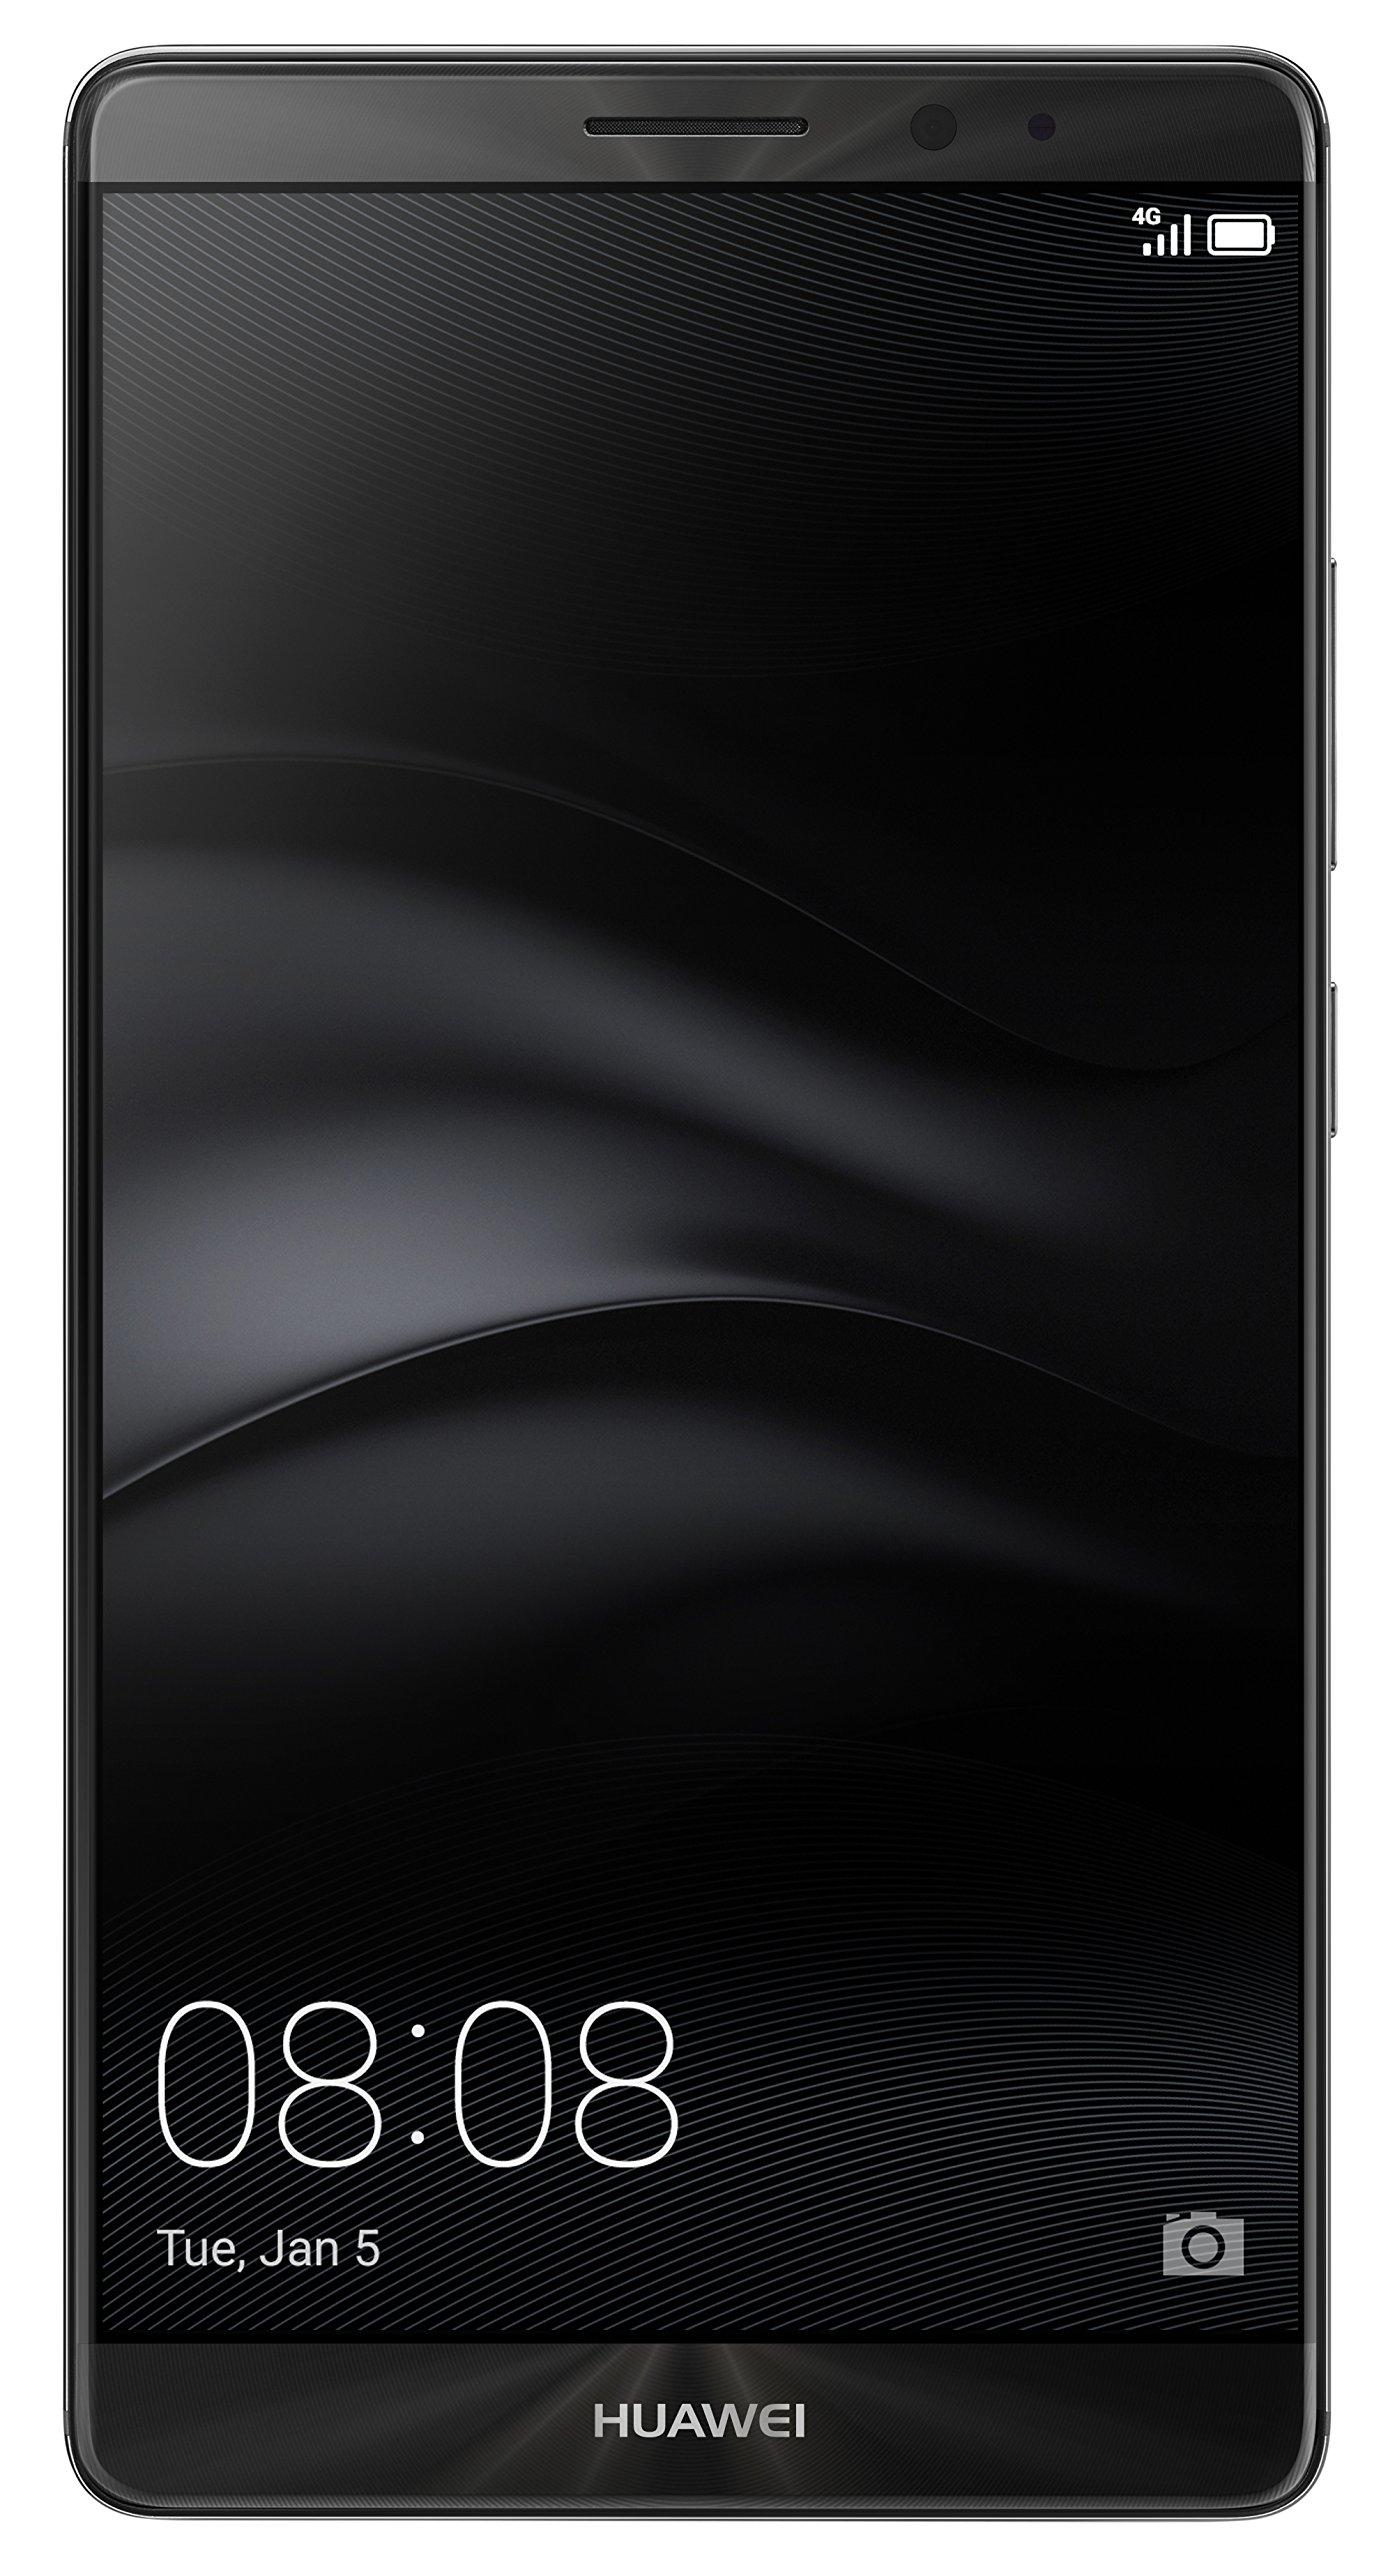 Huawei Mate 8 NXT-L29 32GB Dual SIM Factory Unlocked GSM Smartphone - International Version, No Warranty (Grey)